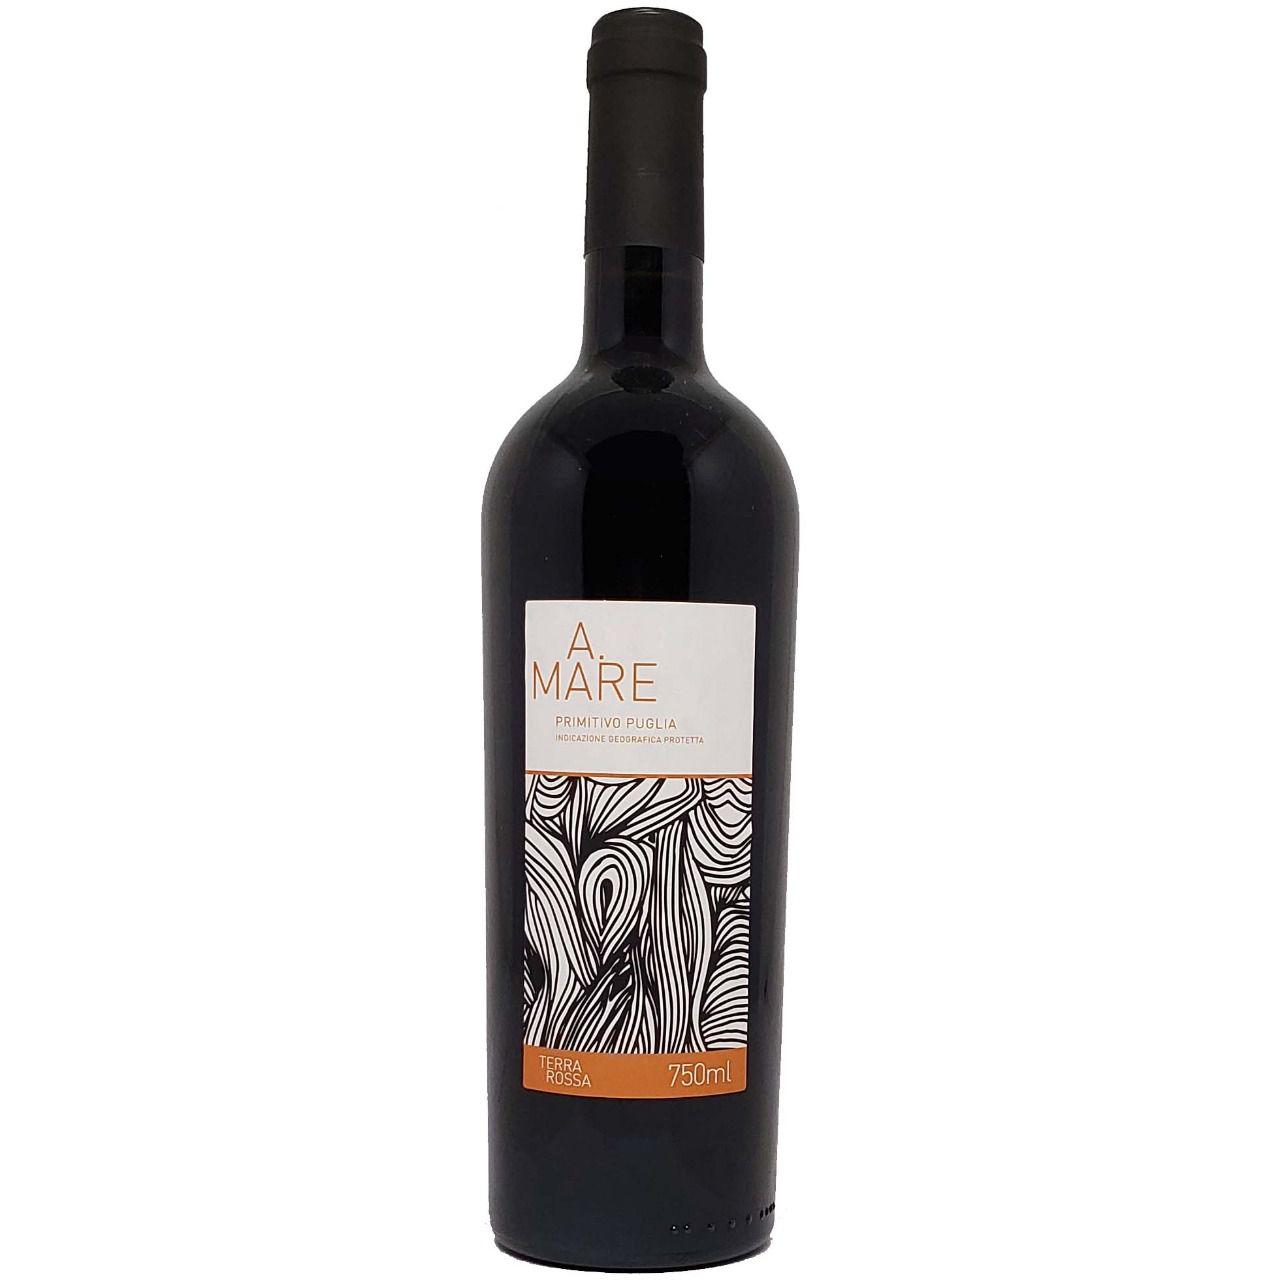 Vinho Tinto A.Mare Primitivo Puglia Terra Rossa - 750ml -